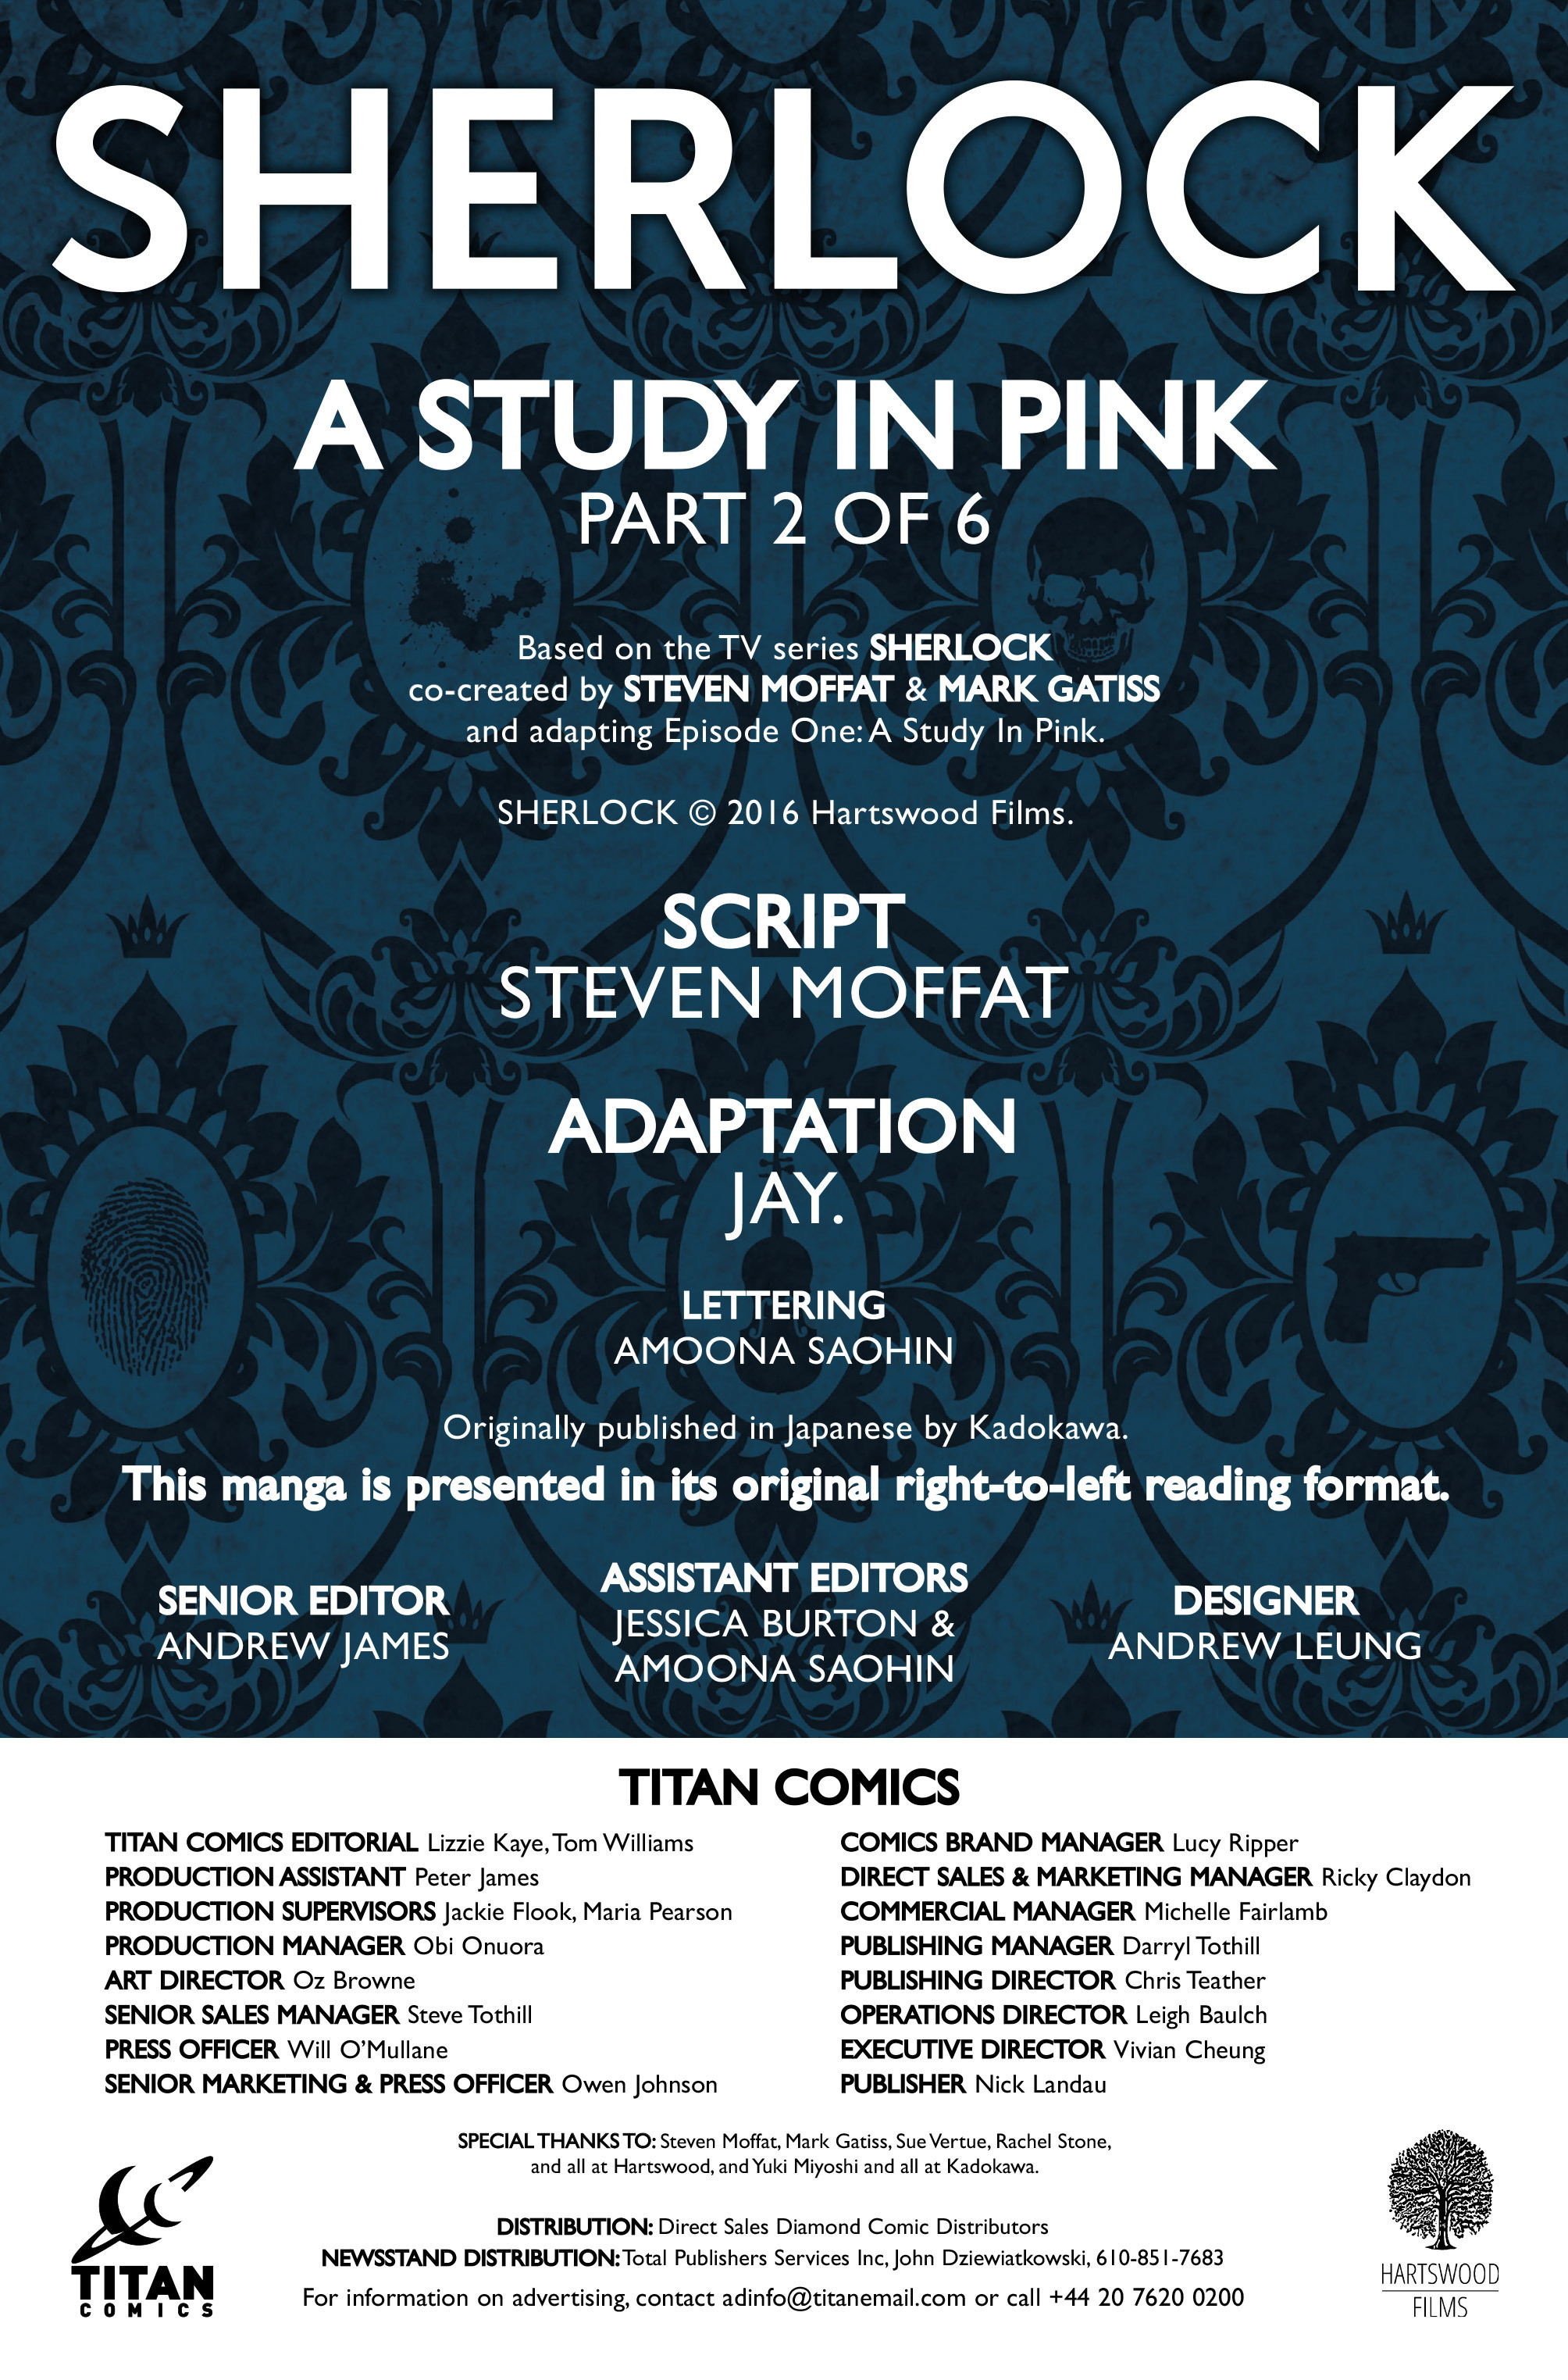 Read online Sherlock: A Study In Pink comic -  Issue #2 - 5